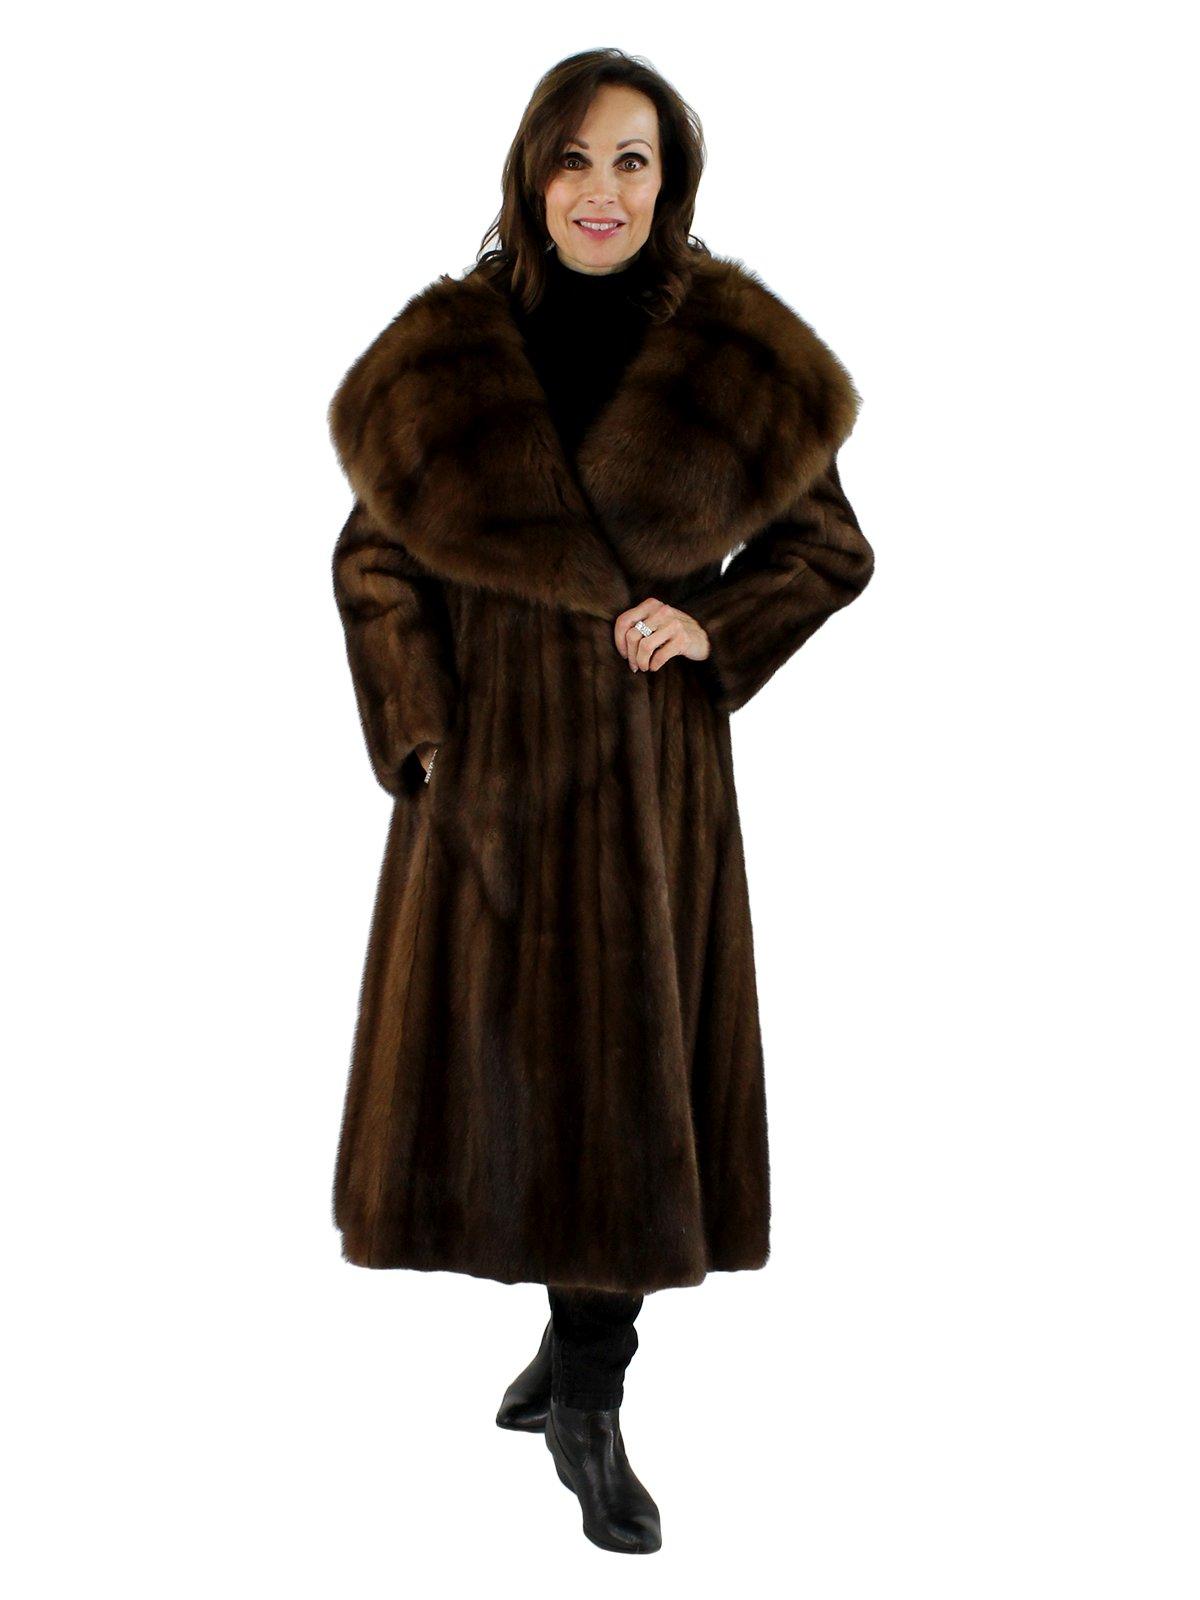 Mink Coat Value >> Lunaraine Mink Fur Coat w/ Sable Collar - Women's Small ...